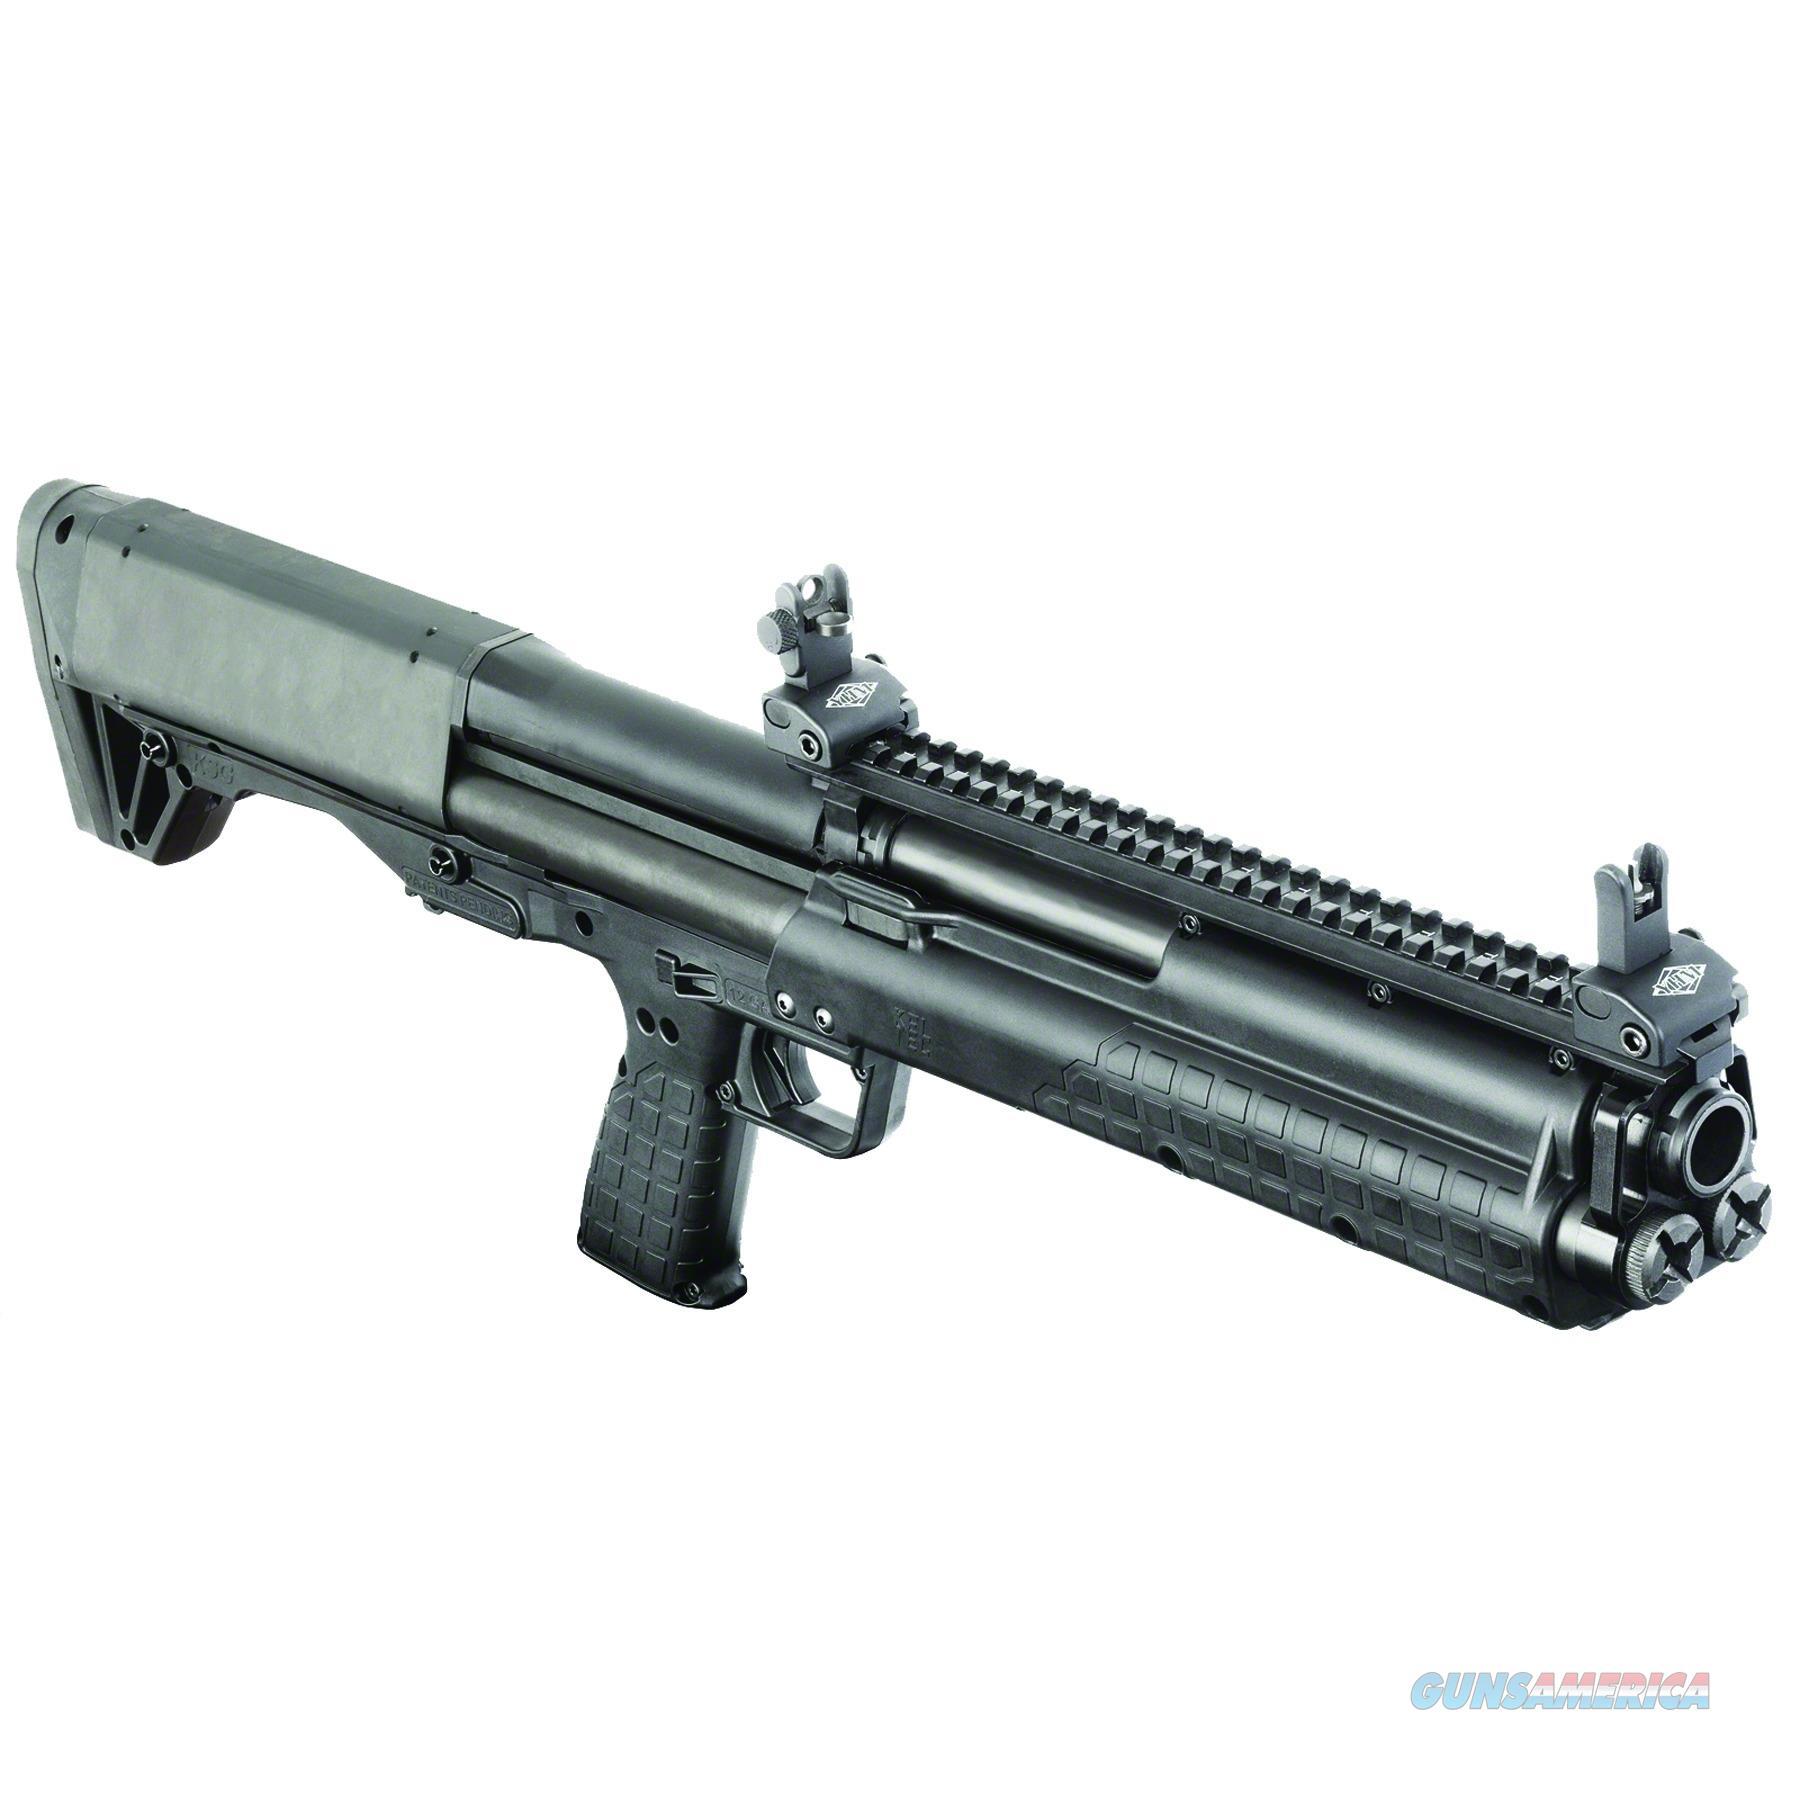 "Keltec Ksg Tactical Pump Shotgun 12Ga 18.5"" Sniper Gray Top/Bottom Pic Rail Brs Exclusive State Laws Apply KSGSNGY  Guns > Shotguns > K Misc Shotguns"